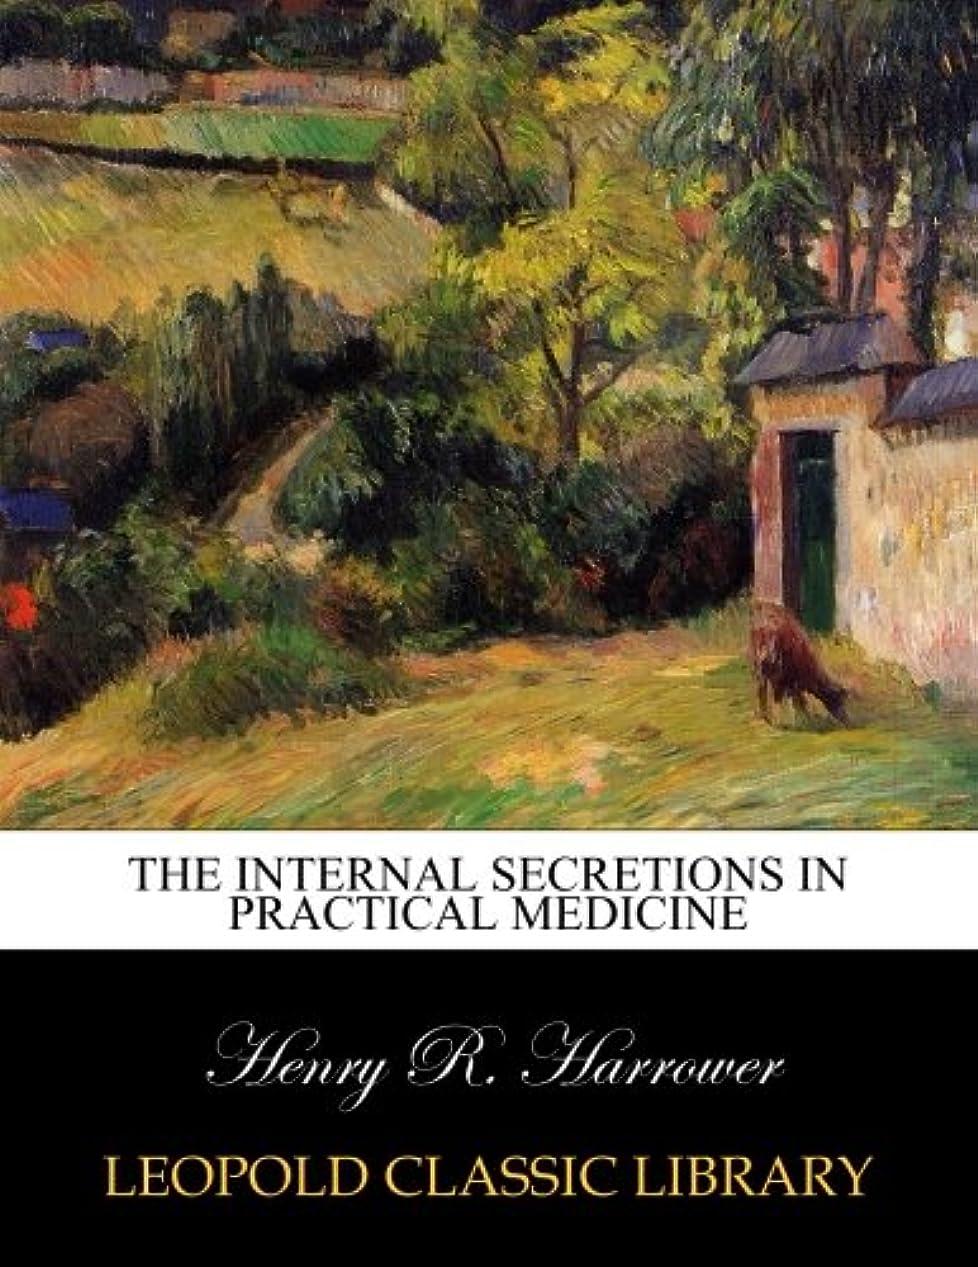 救出侵略海岸The internal secretions in practical medicine